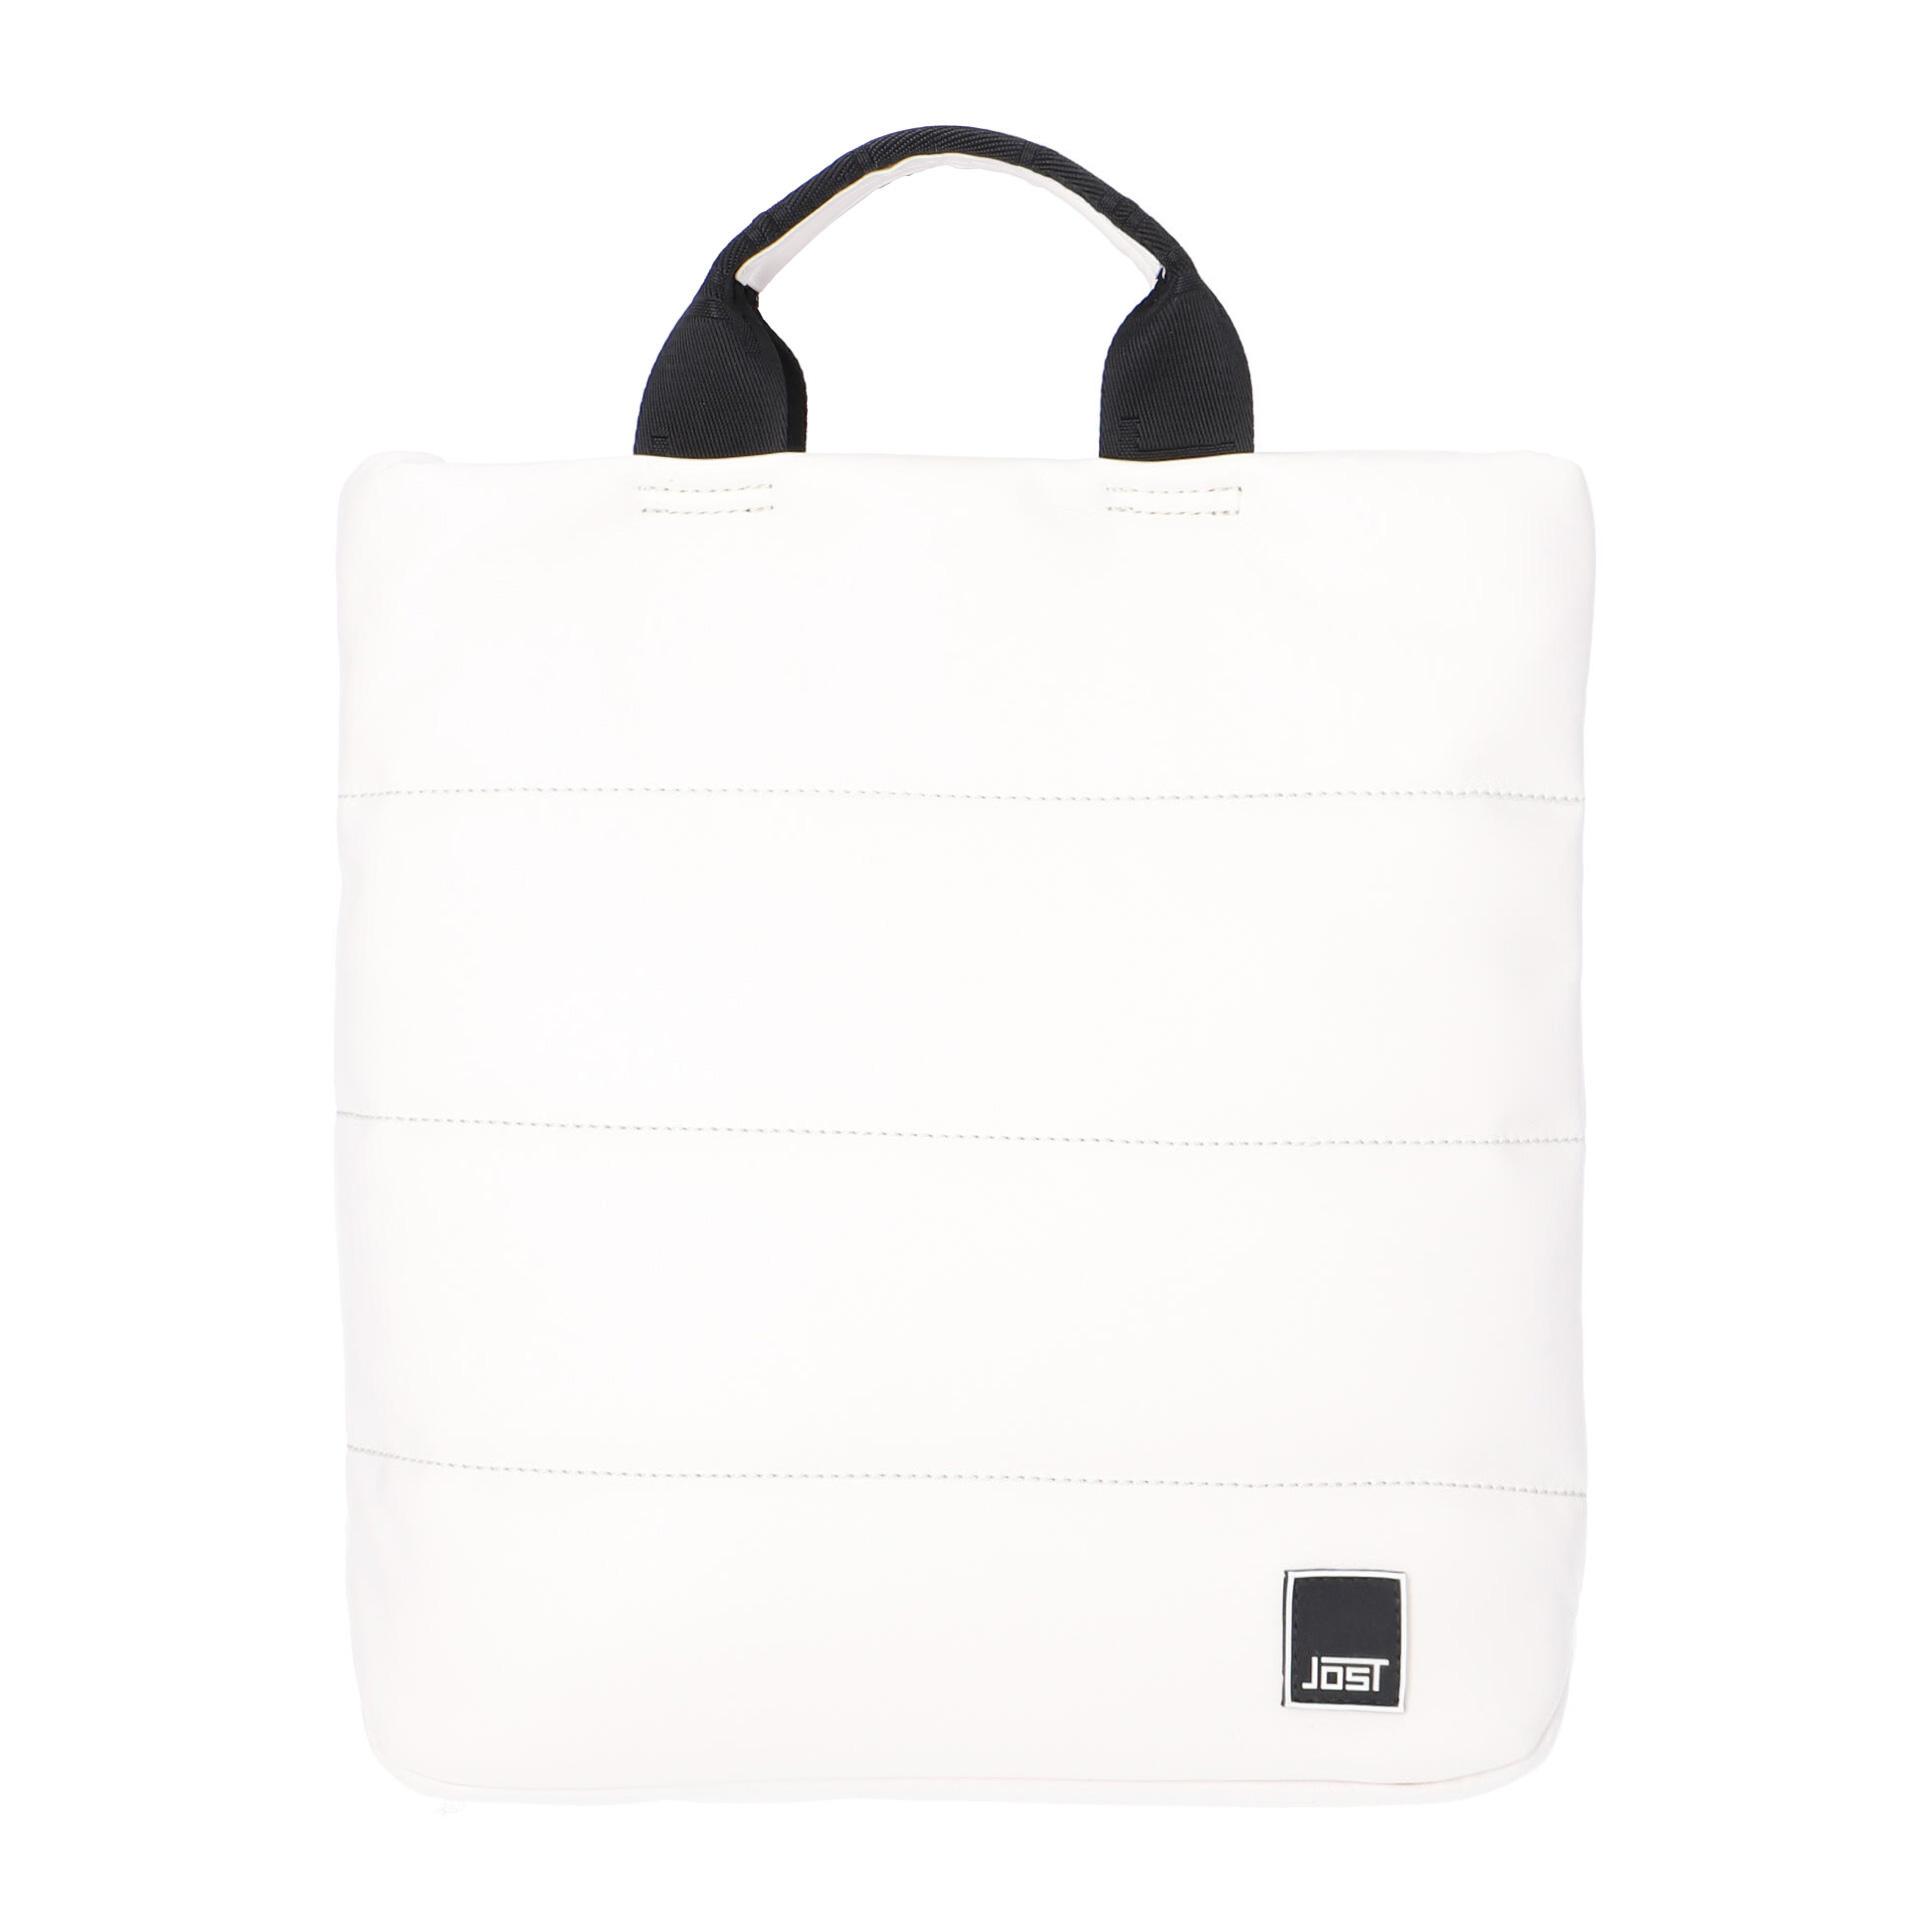 Jost Kaarina X-Change Bag XS aus Recycling Material